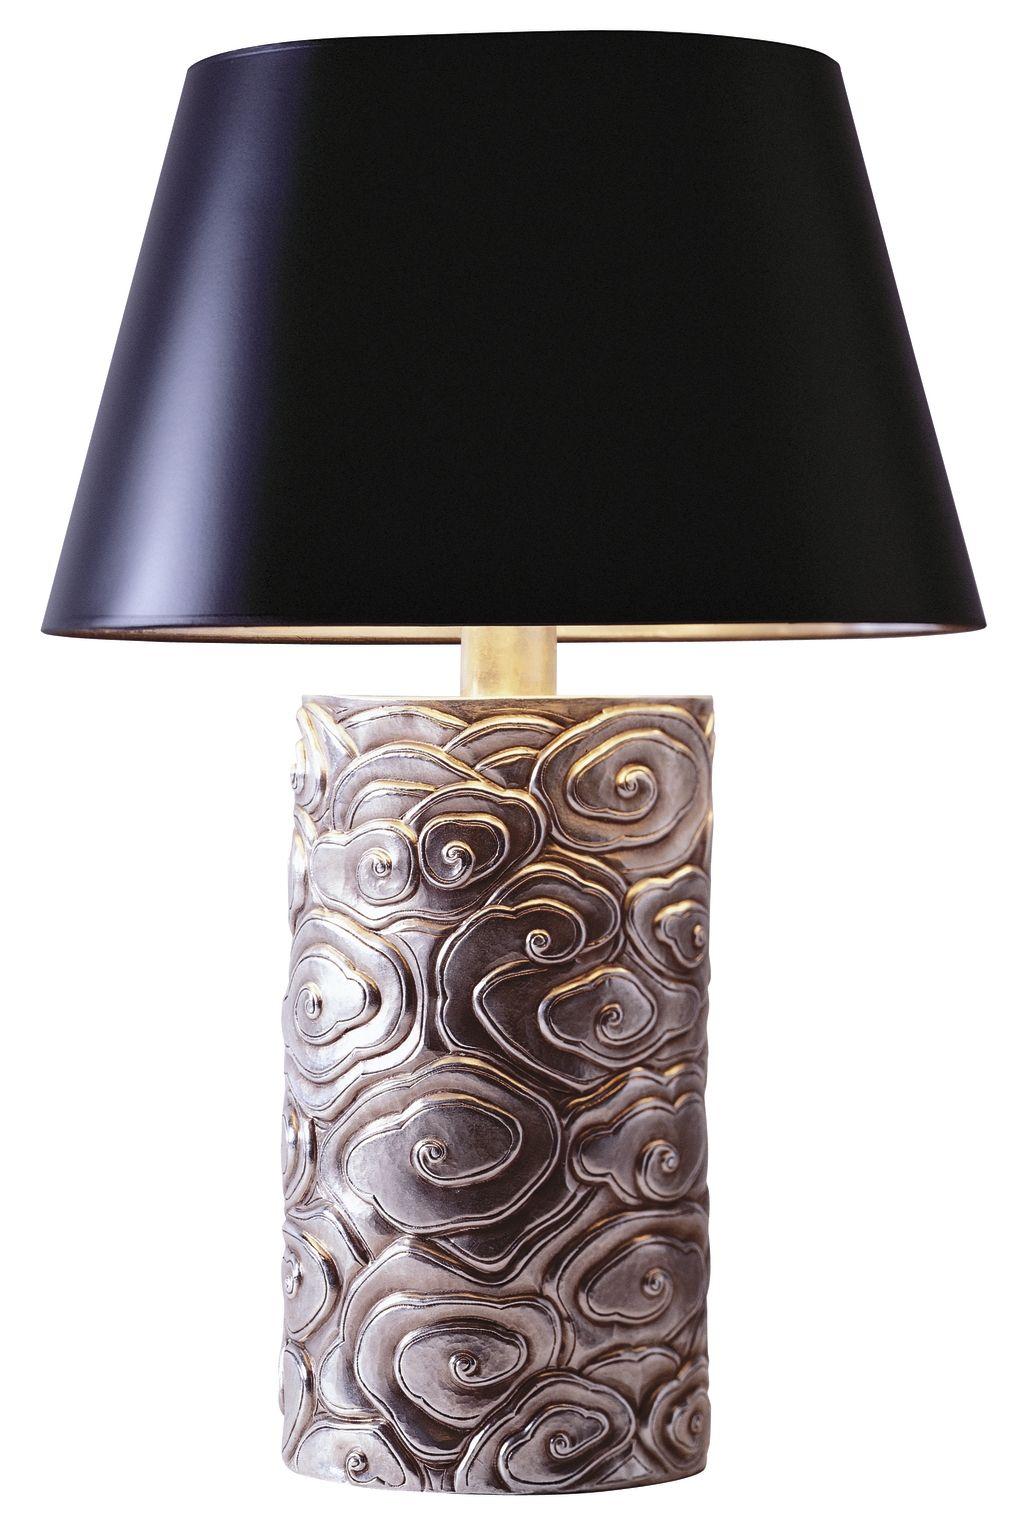 Ml 1006 robert kuo cloud lamp decor furniture pieces pinterest ml 1006 robert kuo cloud lamp arubaitofo Choice Image